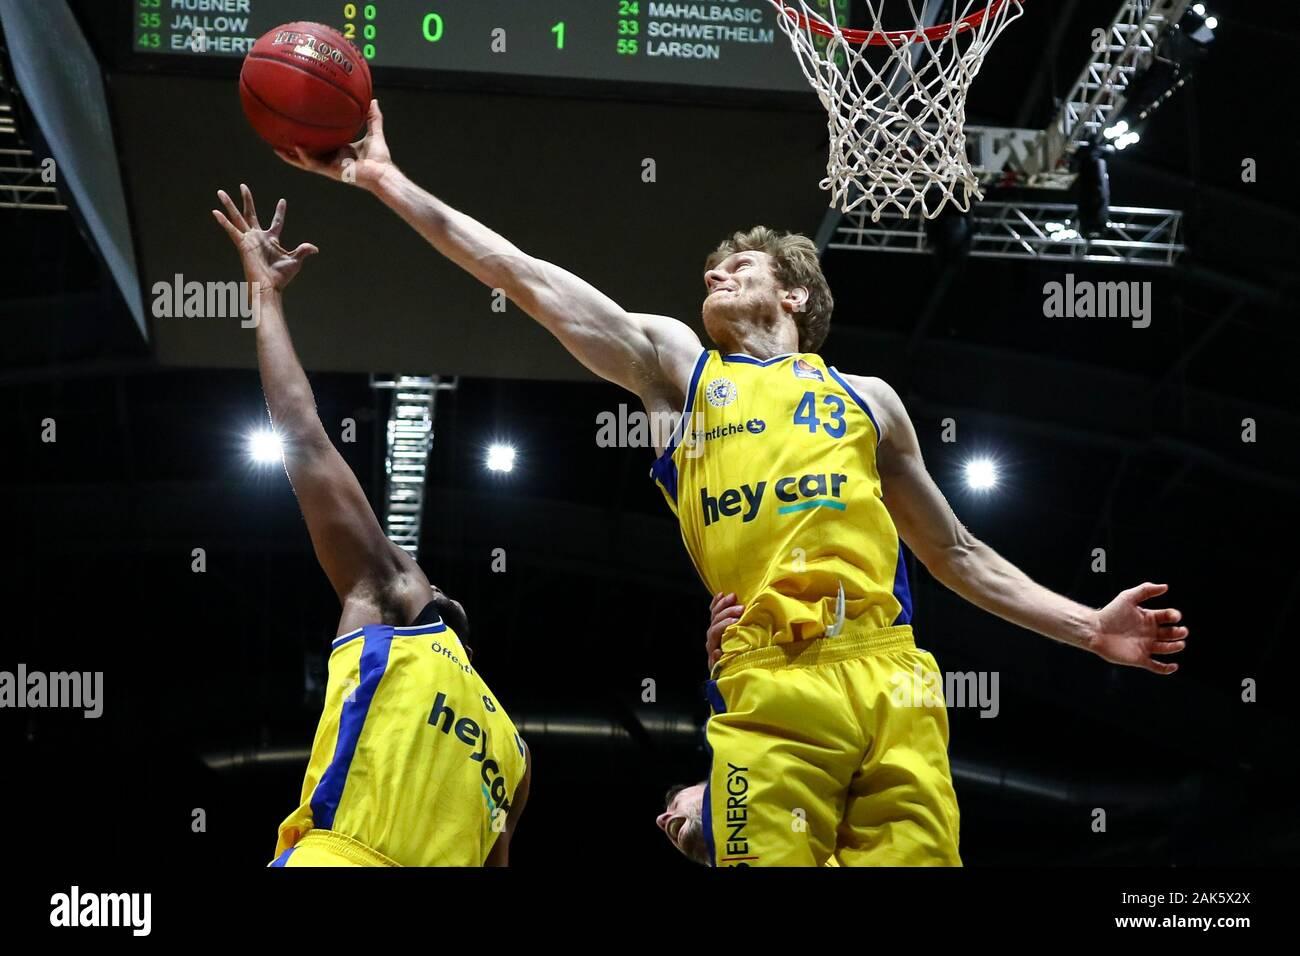 Basketball: Philipp Schwethelm verlängert bei EWE Baskets Oldenburg